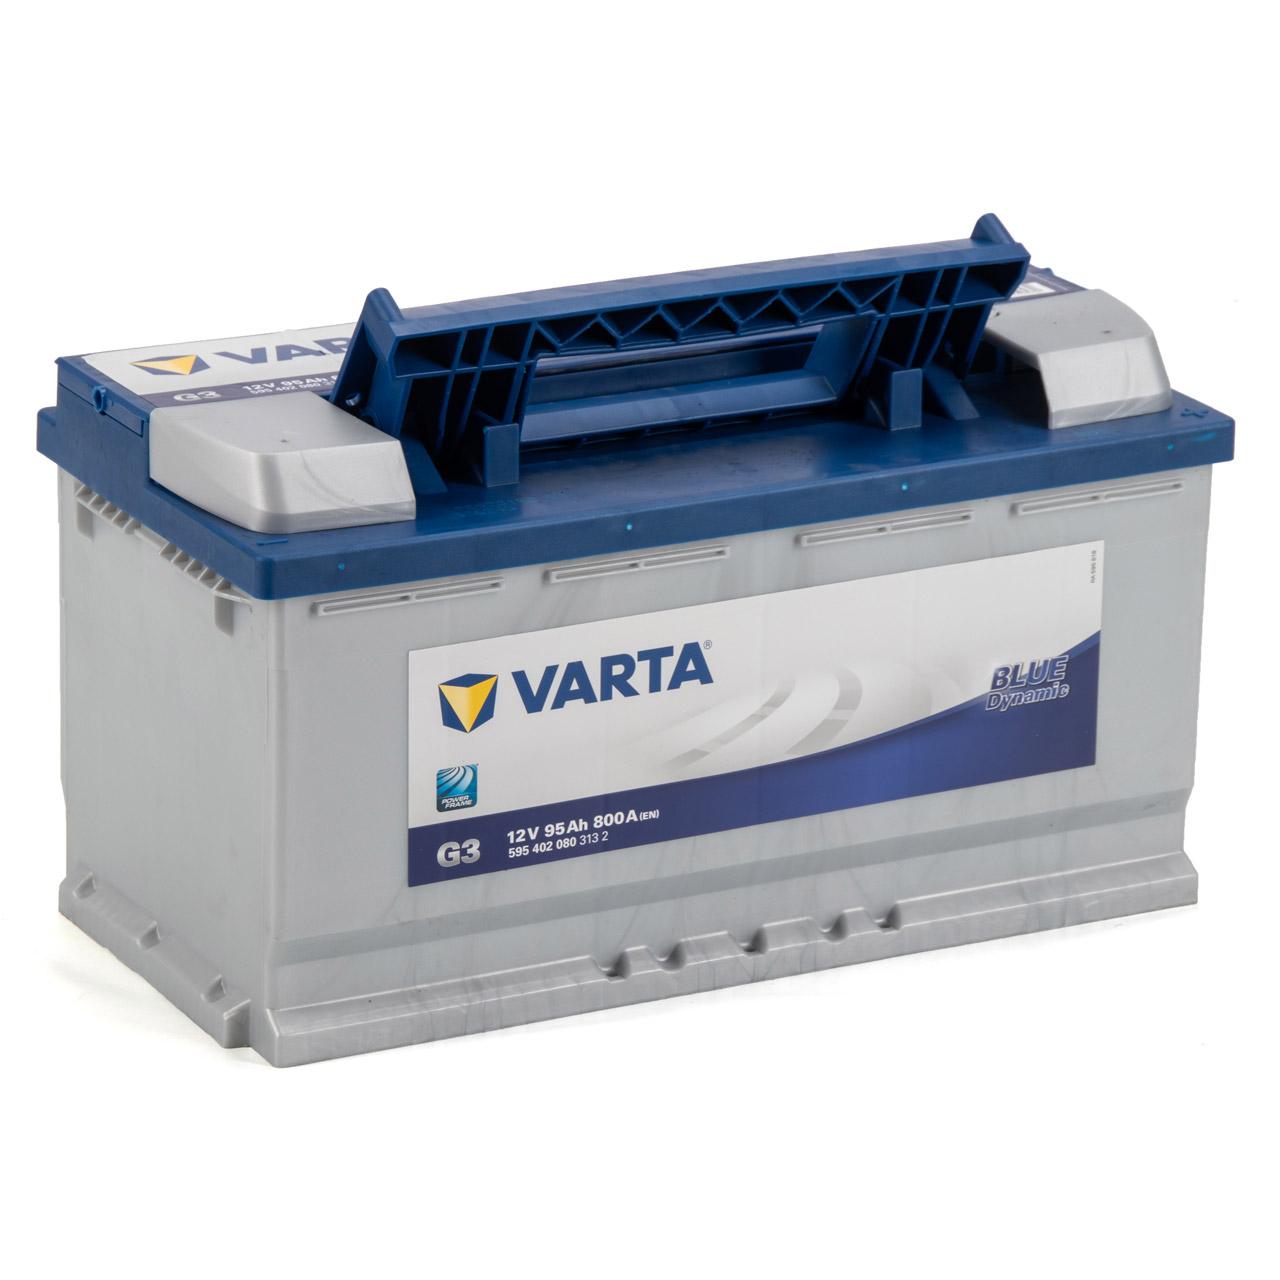 VARTA BLUE dynamic G3 Autobatterie Batterie Starterbatterie 12V 95Ah 800A